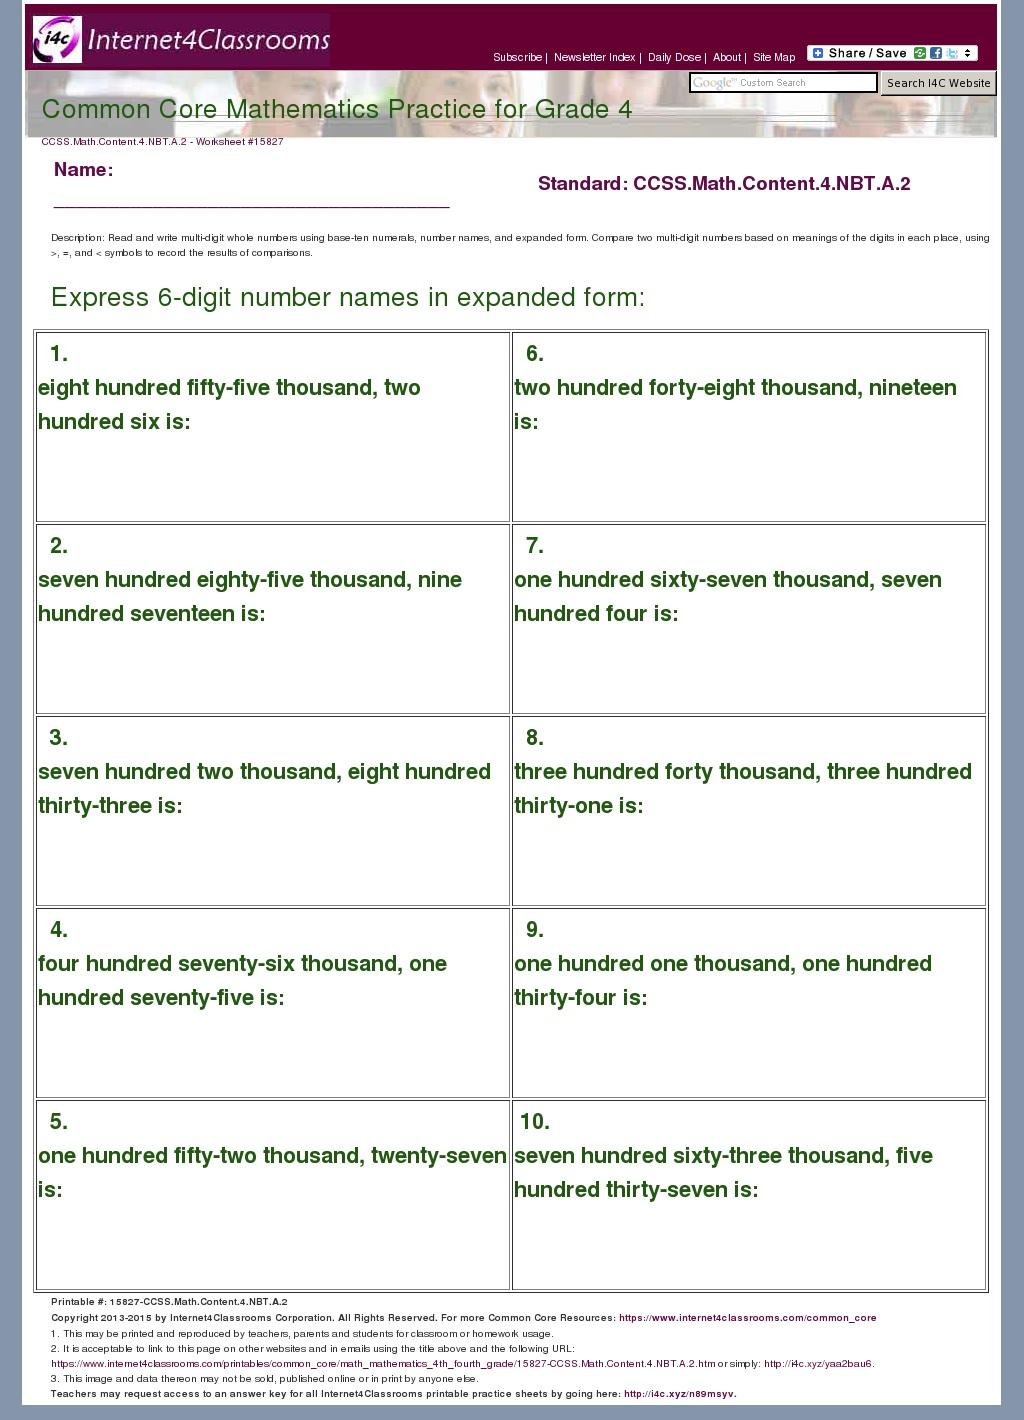 worksheet Common Core Math Grade 4 Worksheets descriptiondownload worksheet 15827 ccss math content 4 nbt a 2 grade mathematics common core